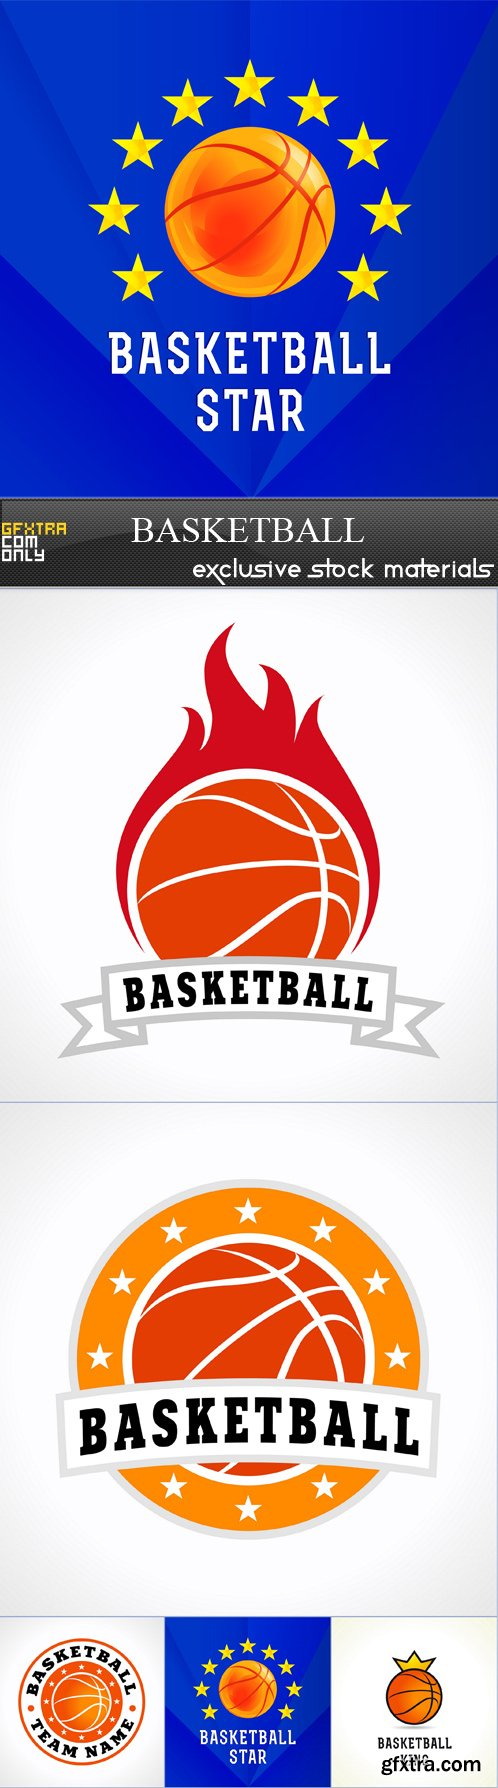 Basketball - 5 JPRGs